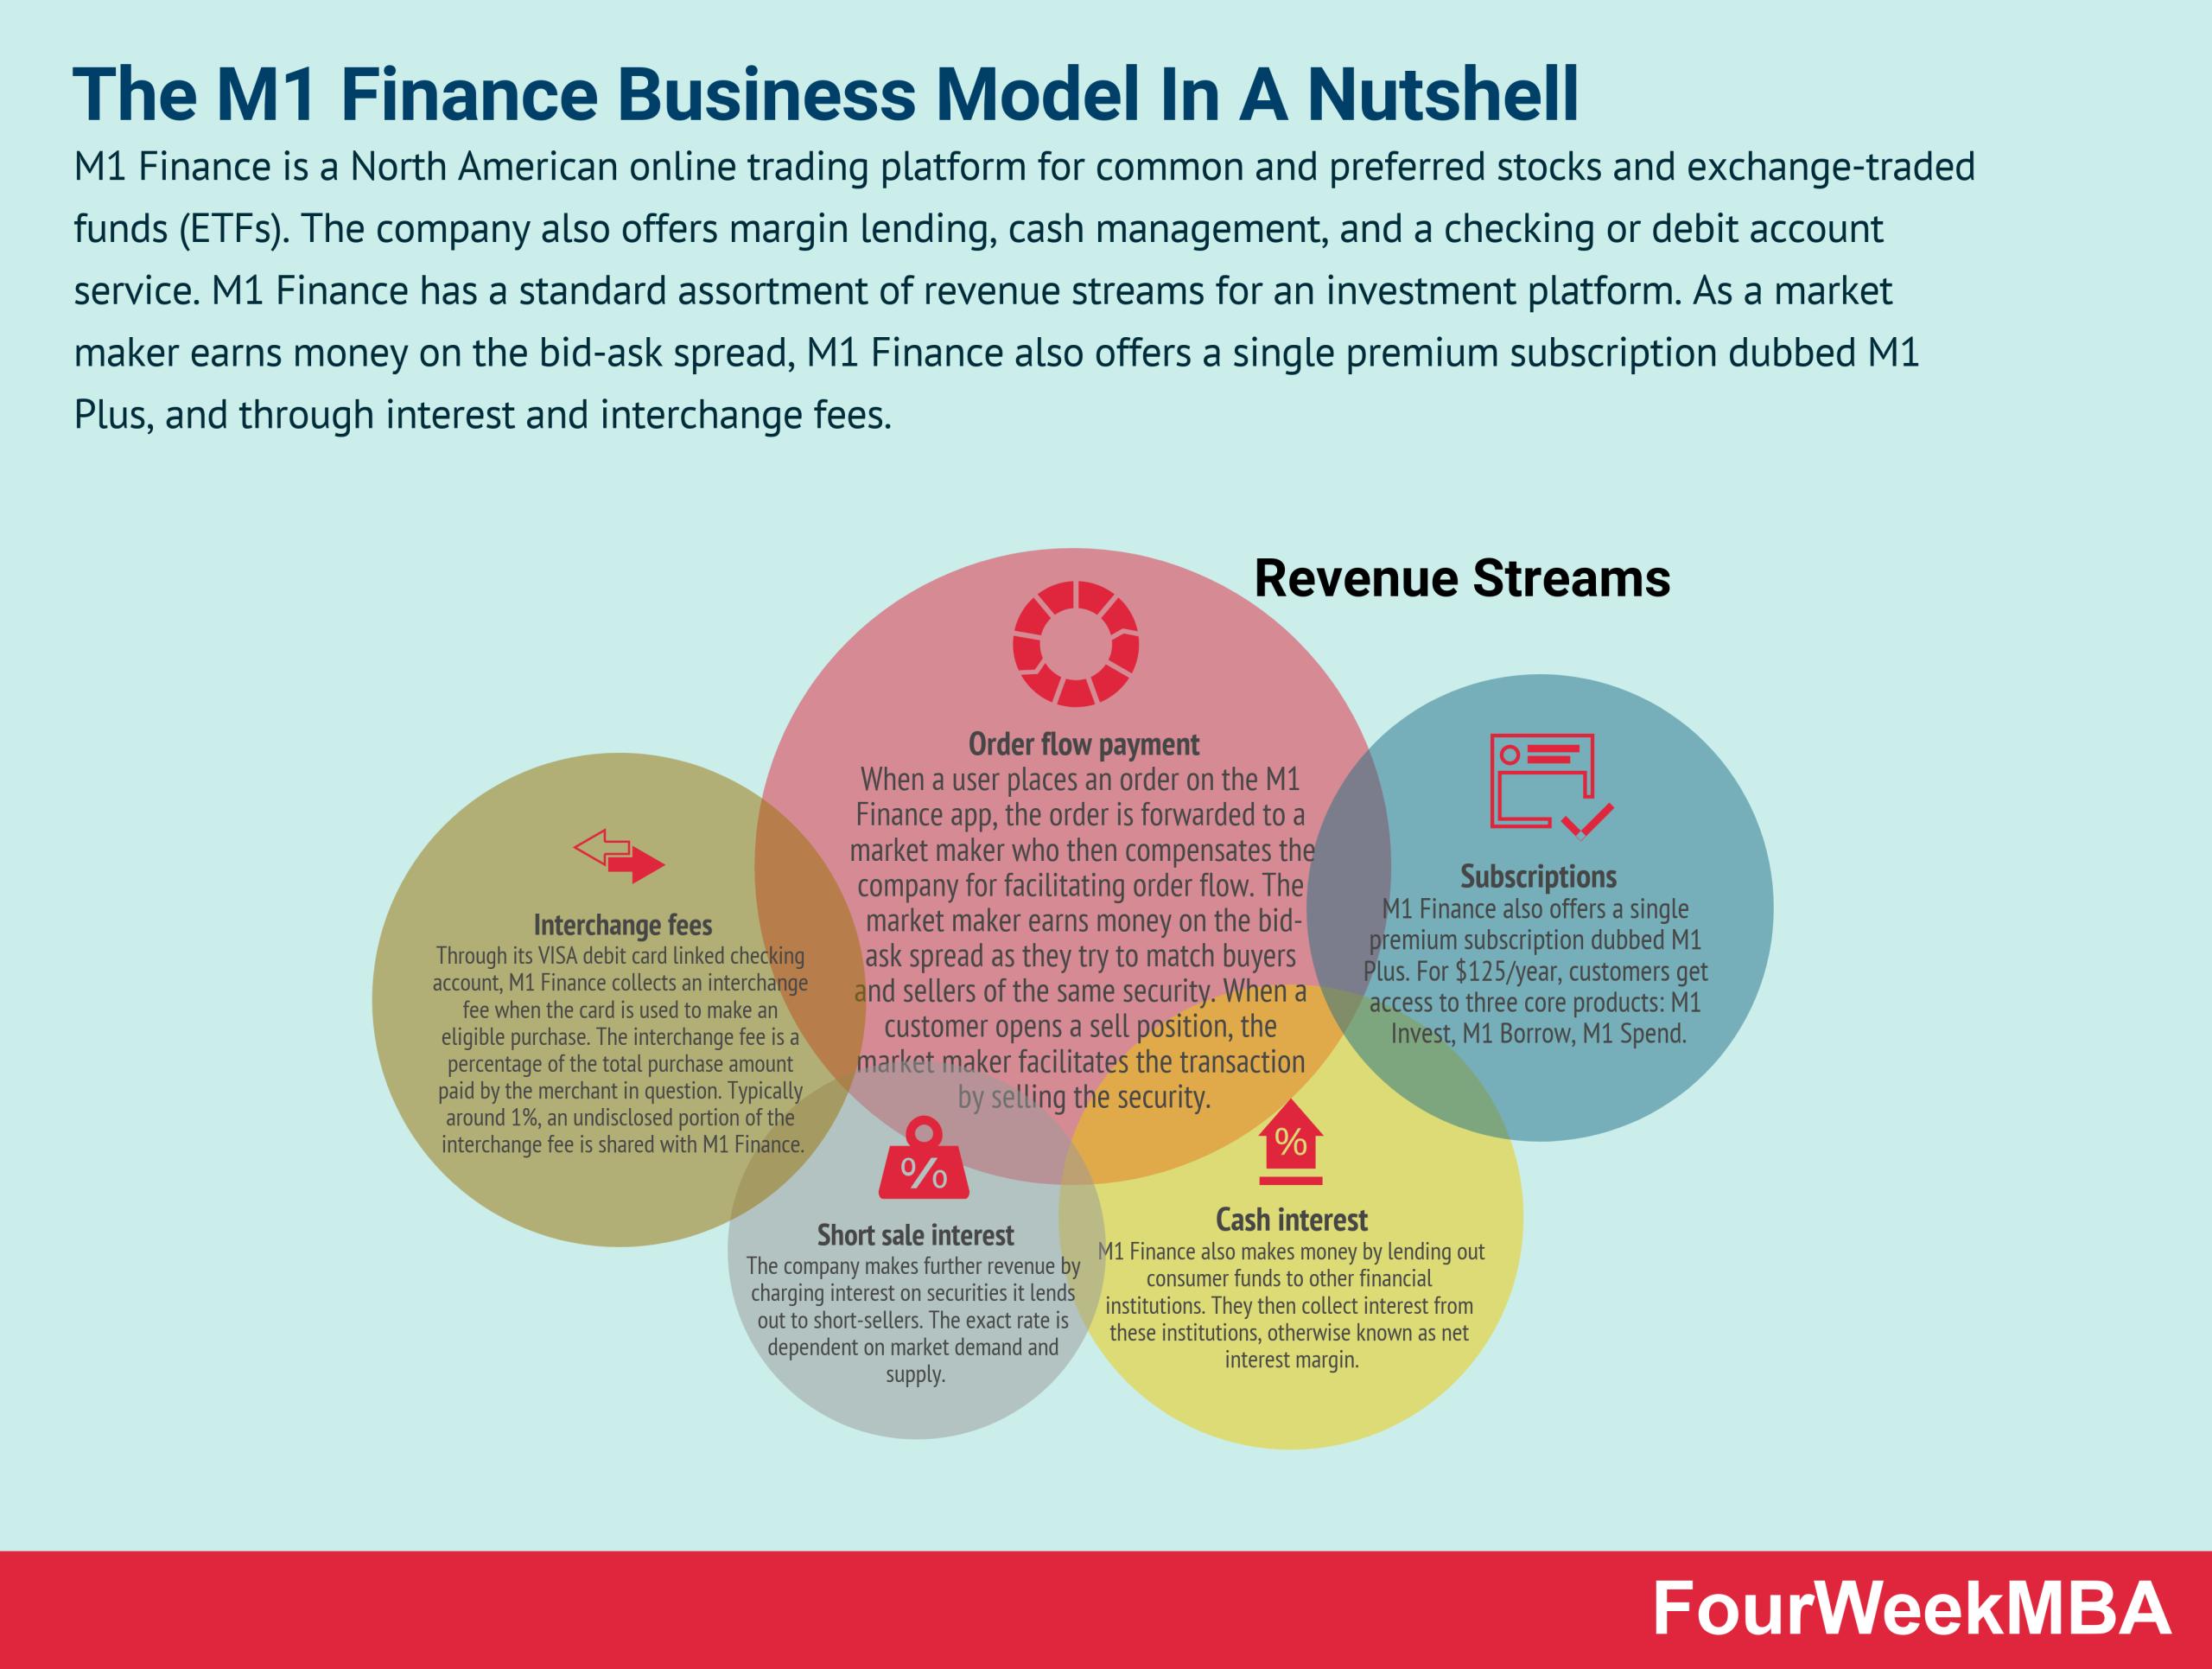 how-does-m1-finance-make-money